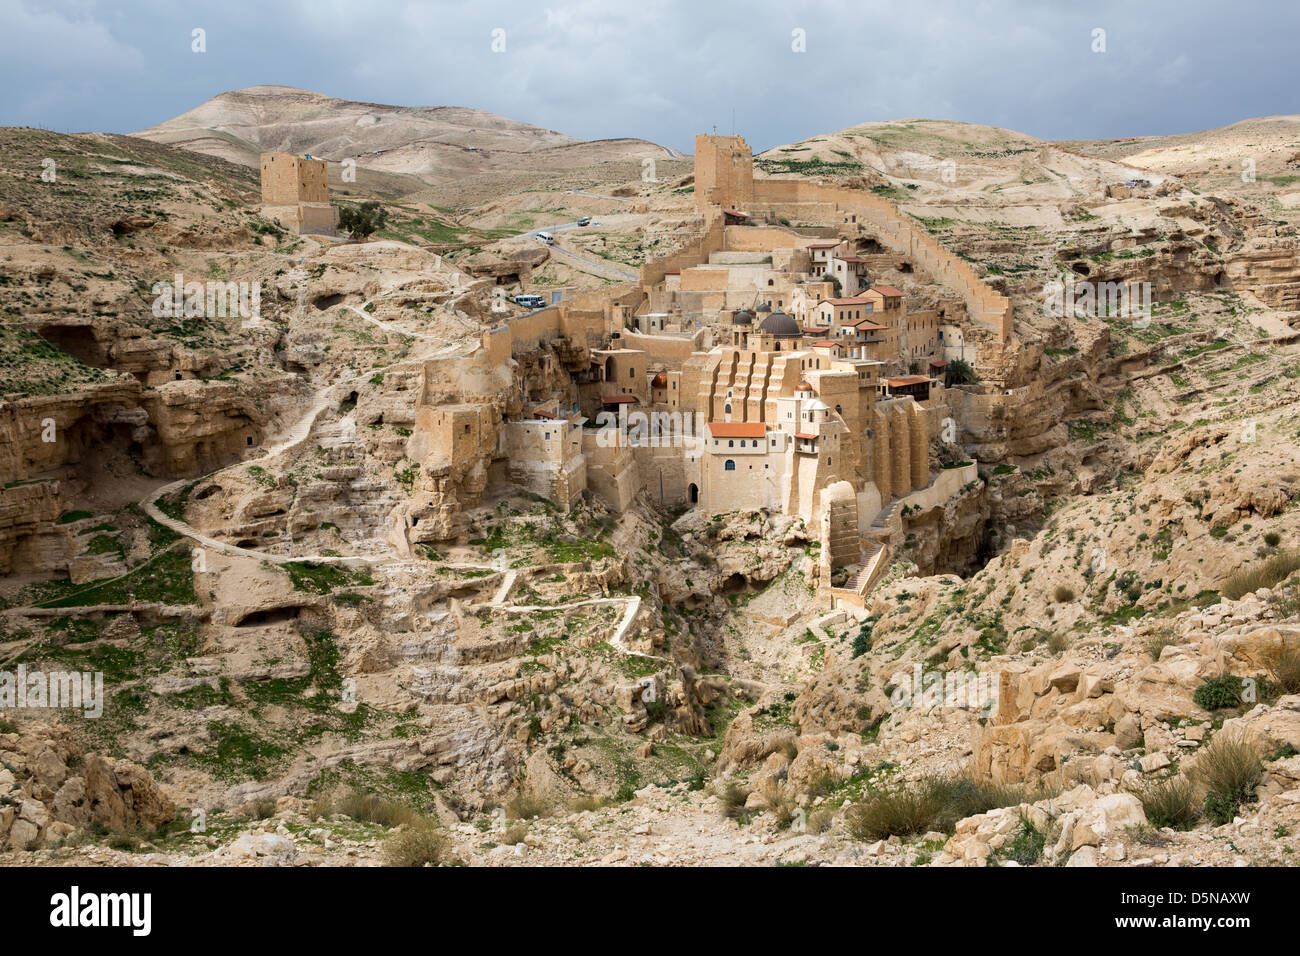 Marsaba monastery in the Judean desert in Israel - Stock Image